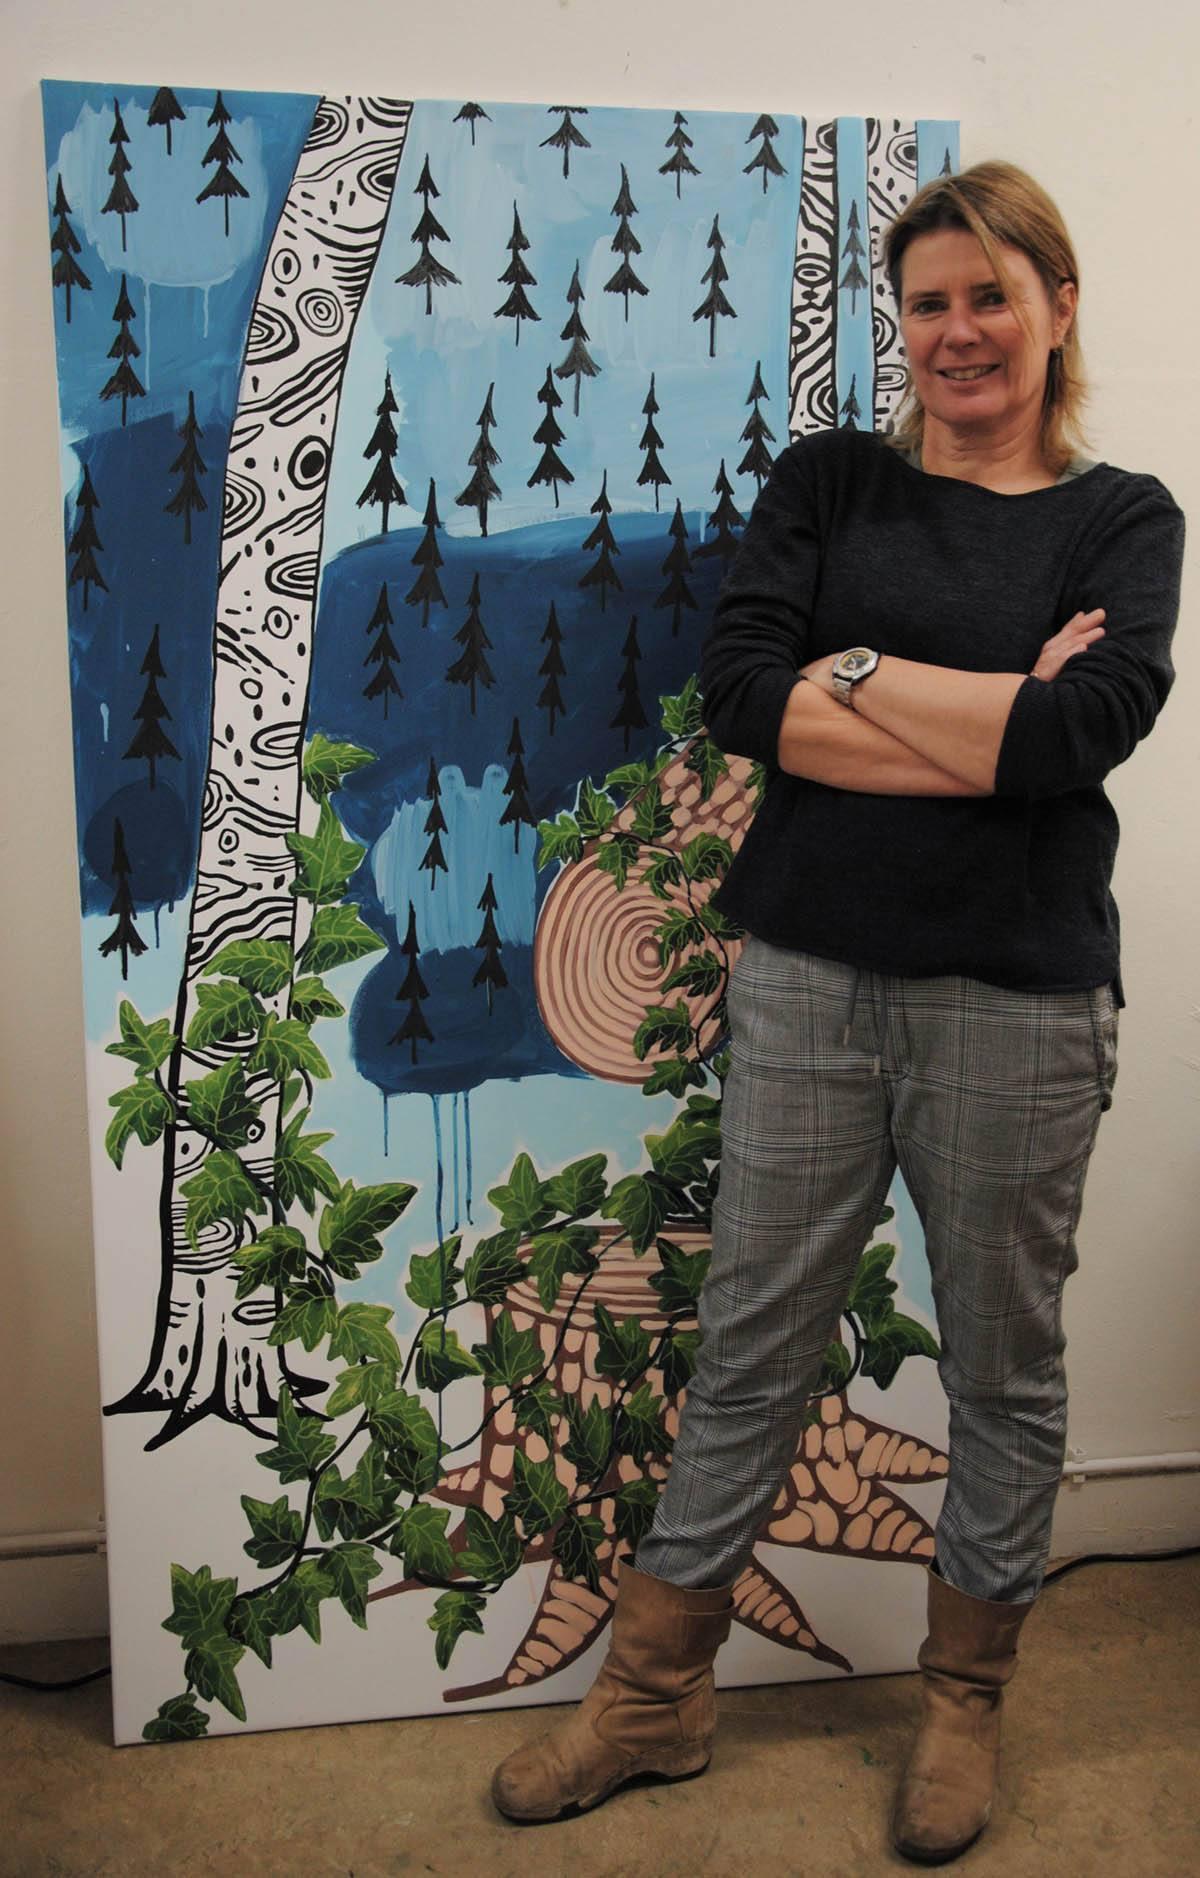 Portret foto in atelier van Nynke Kuipers